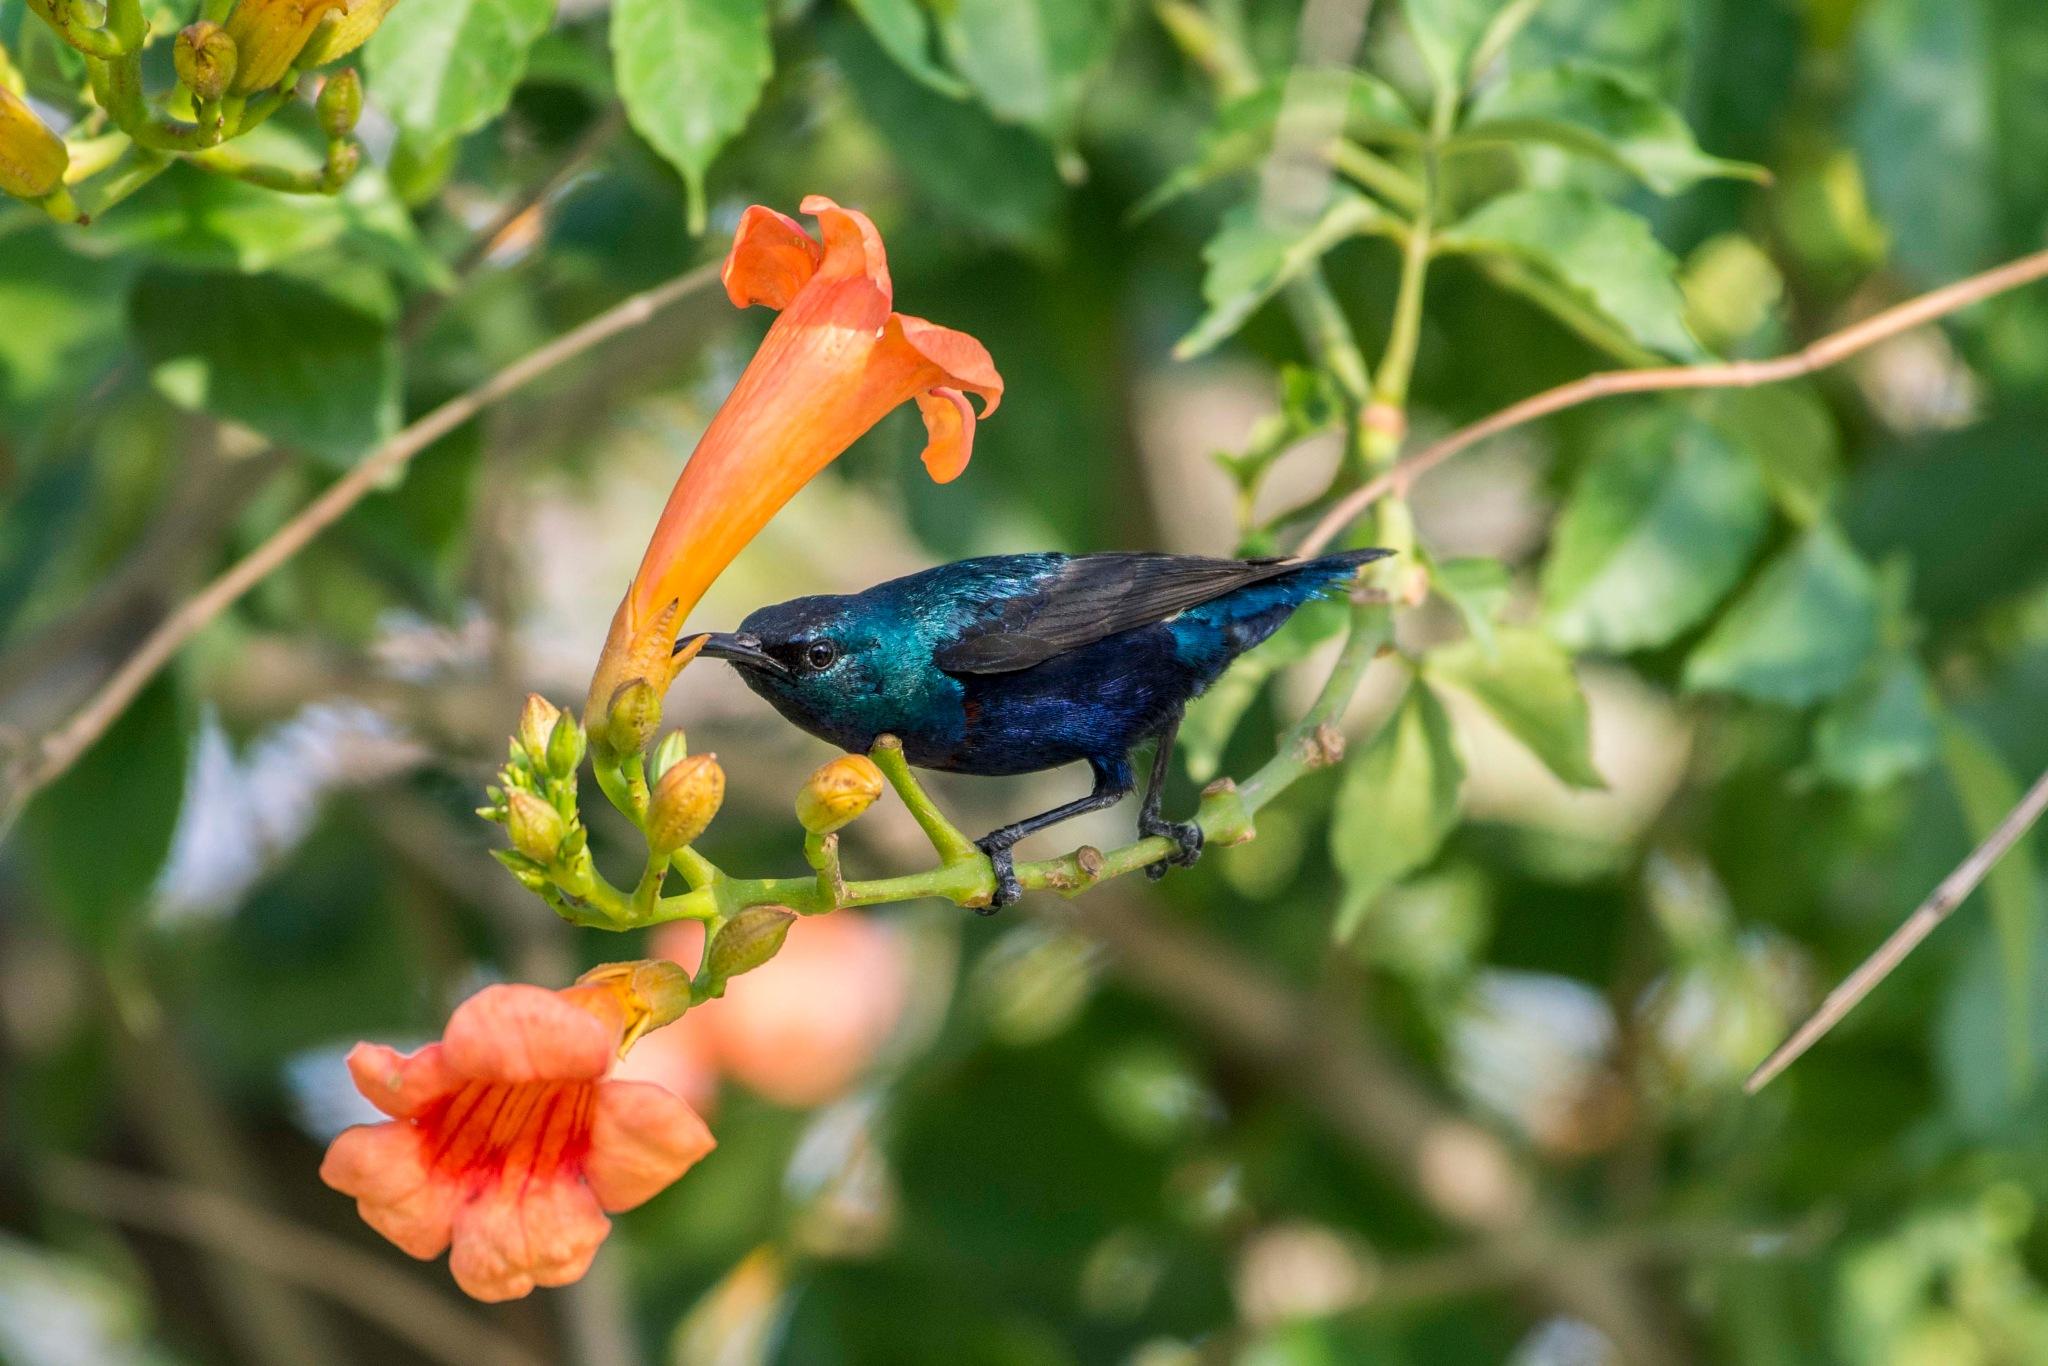 Male Sun Bird by Muhammad Azhar Hafeez